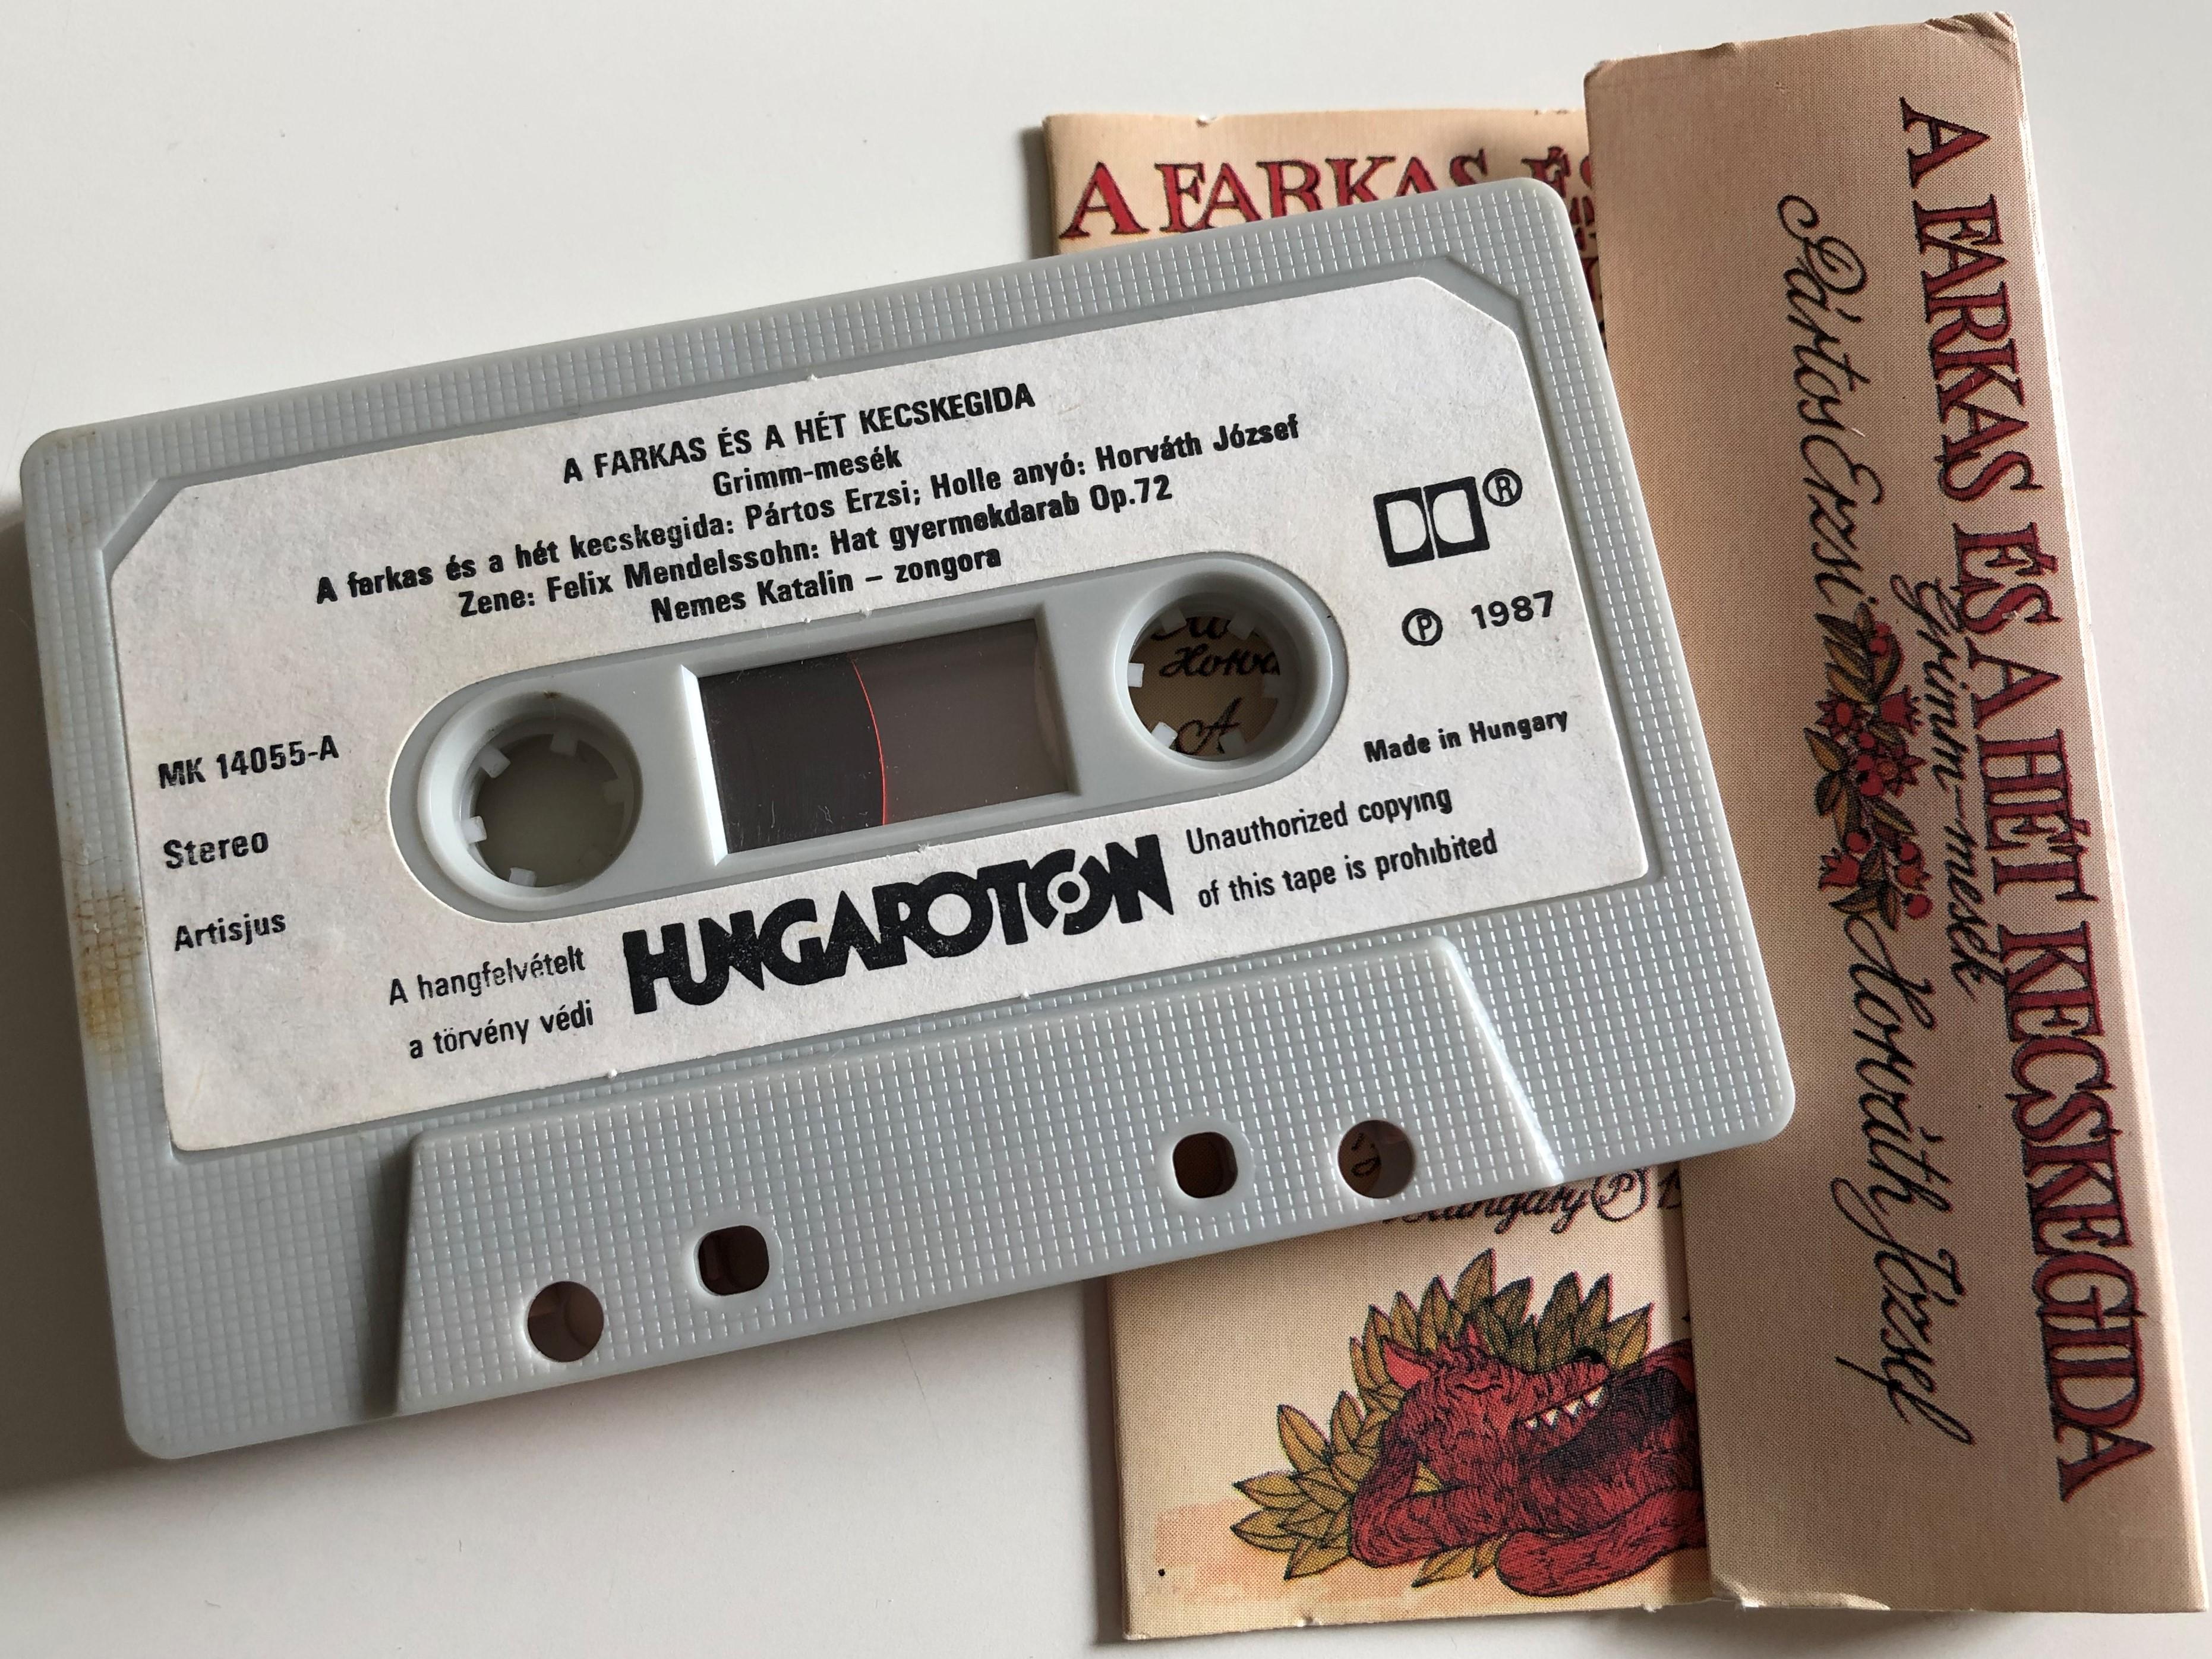 a-farkas-s-a-h-t-kecskegida-grimm-mes-k-p-rtos-erzsi-horv-th-j-zsef-hungaroton-cassette-stereo-mk-14055-3-.jpg